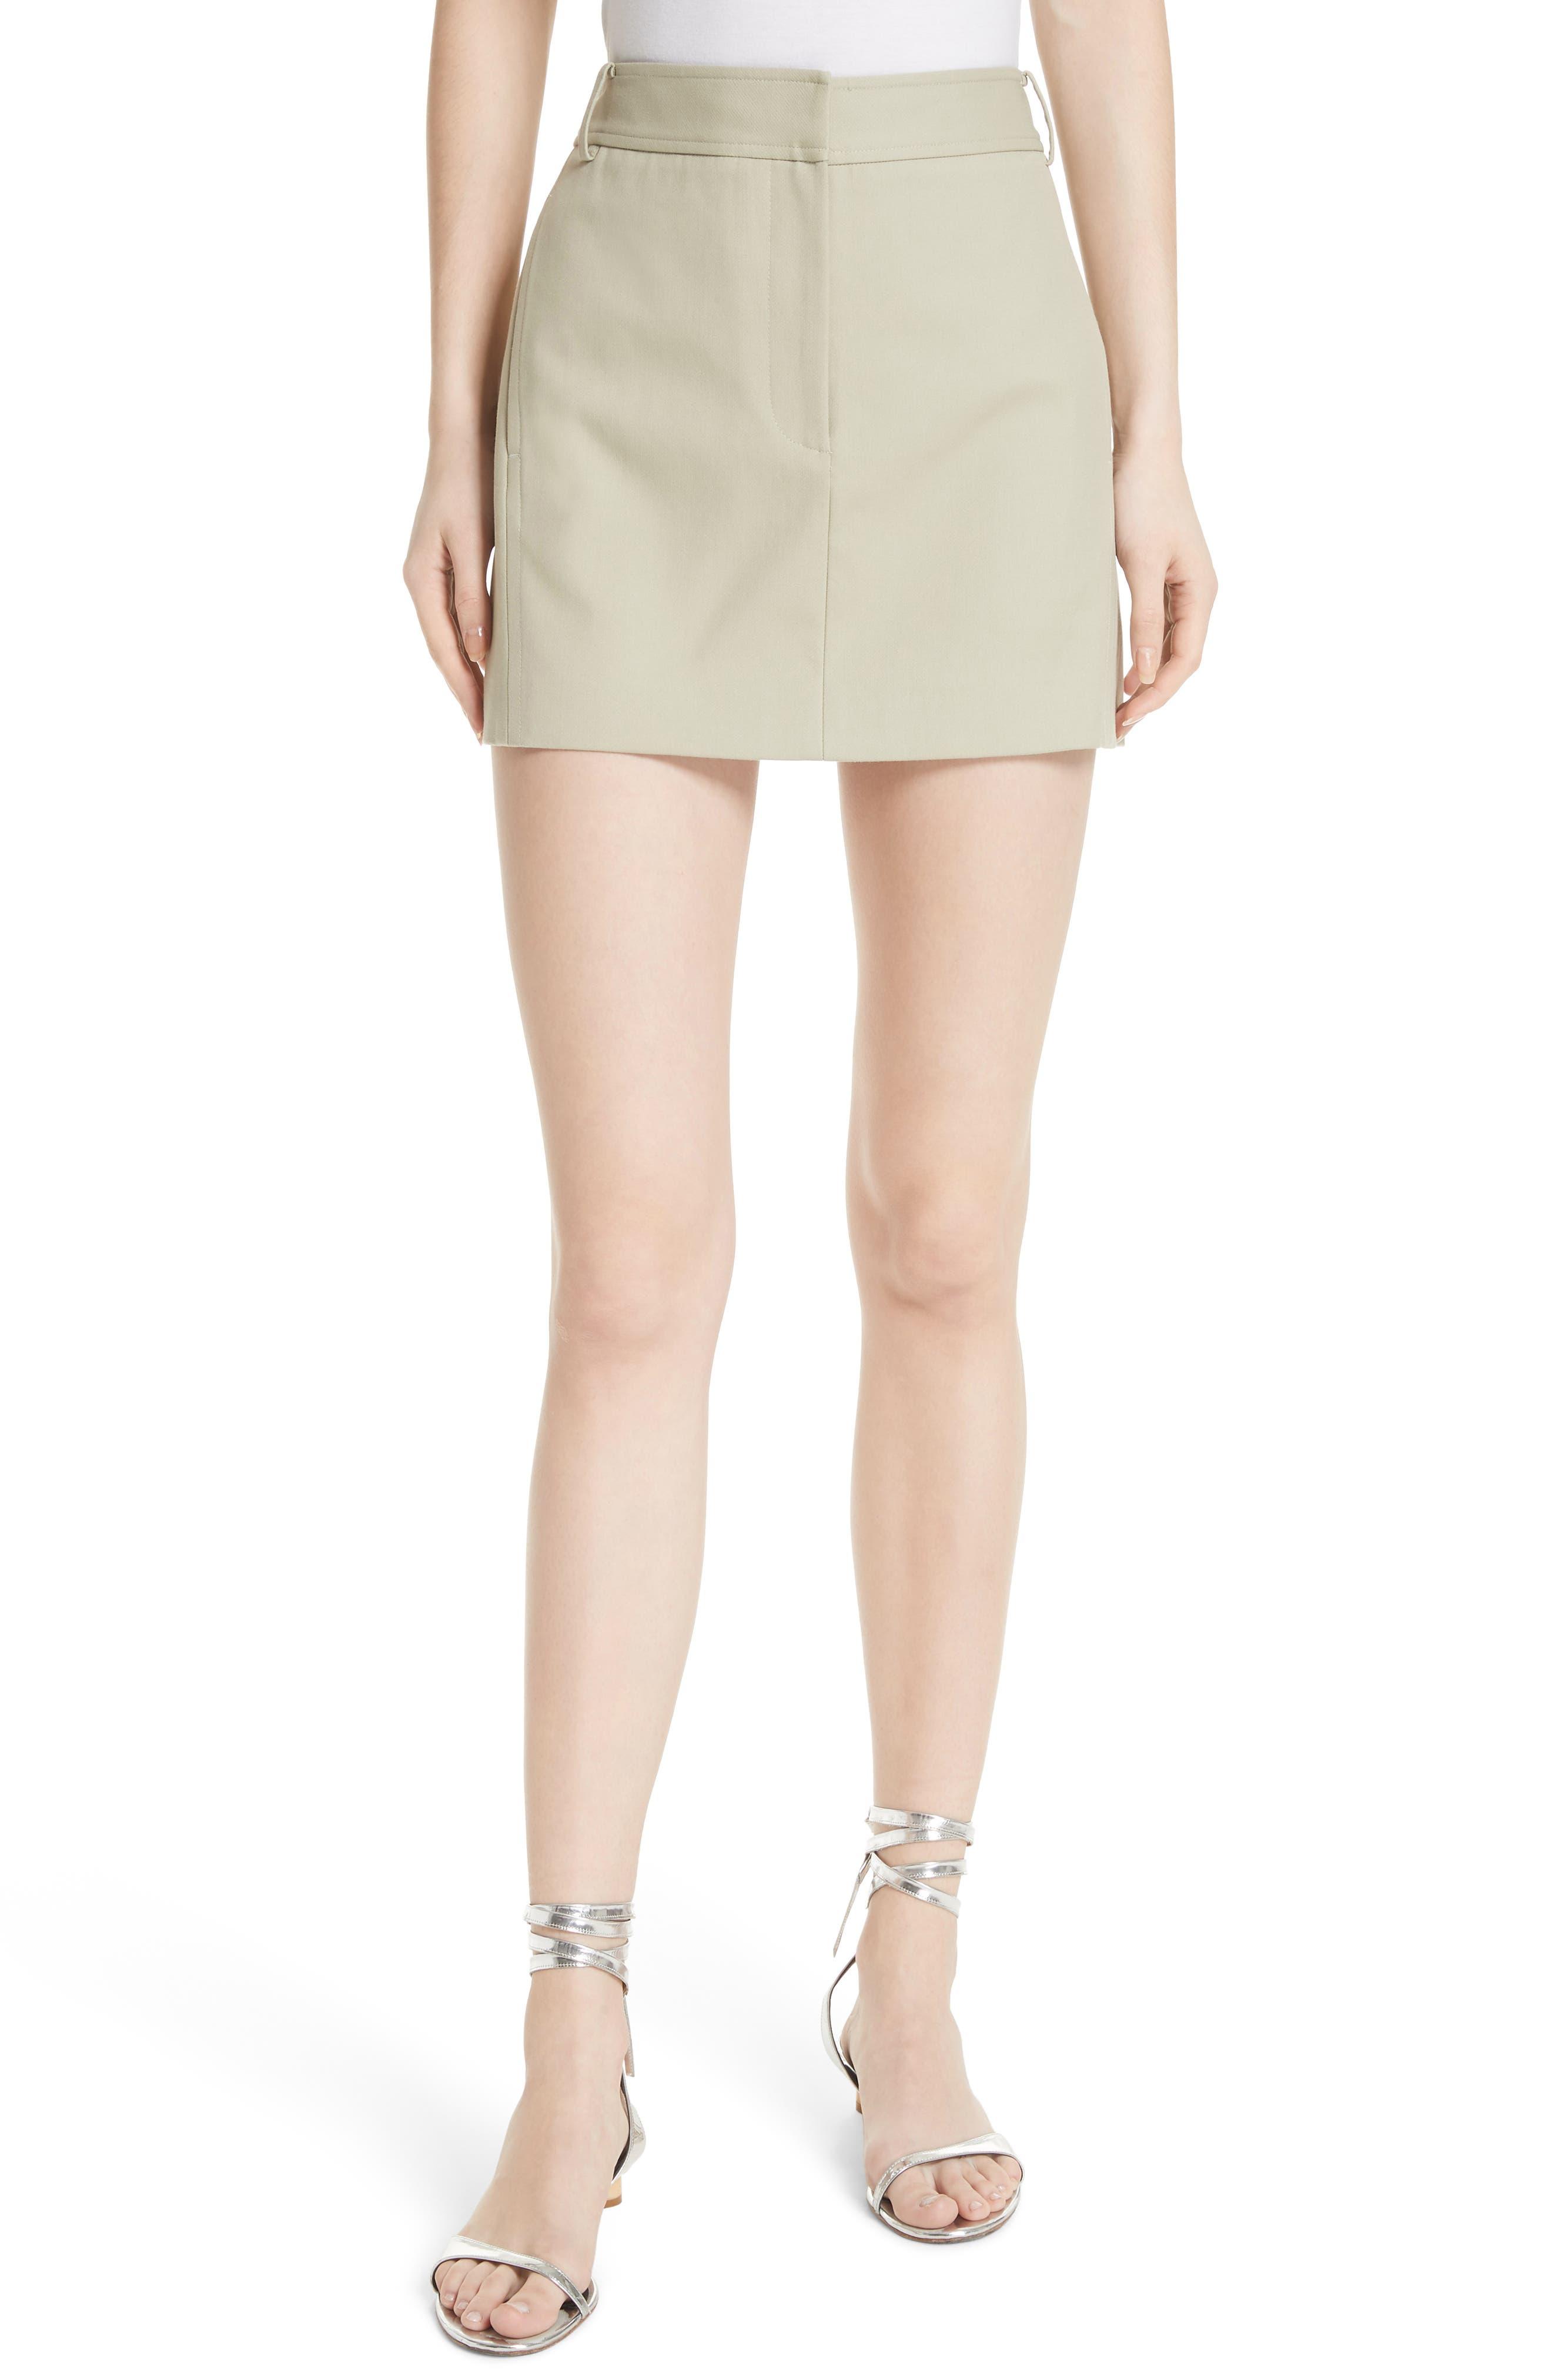 TIBI Margaux Miniskirt, Main, color, 310